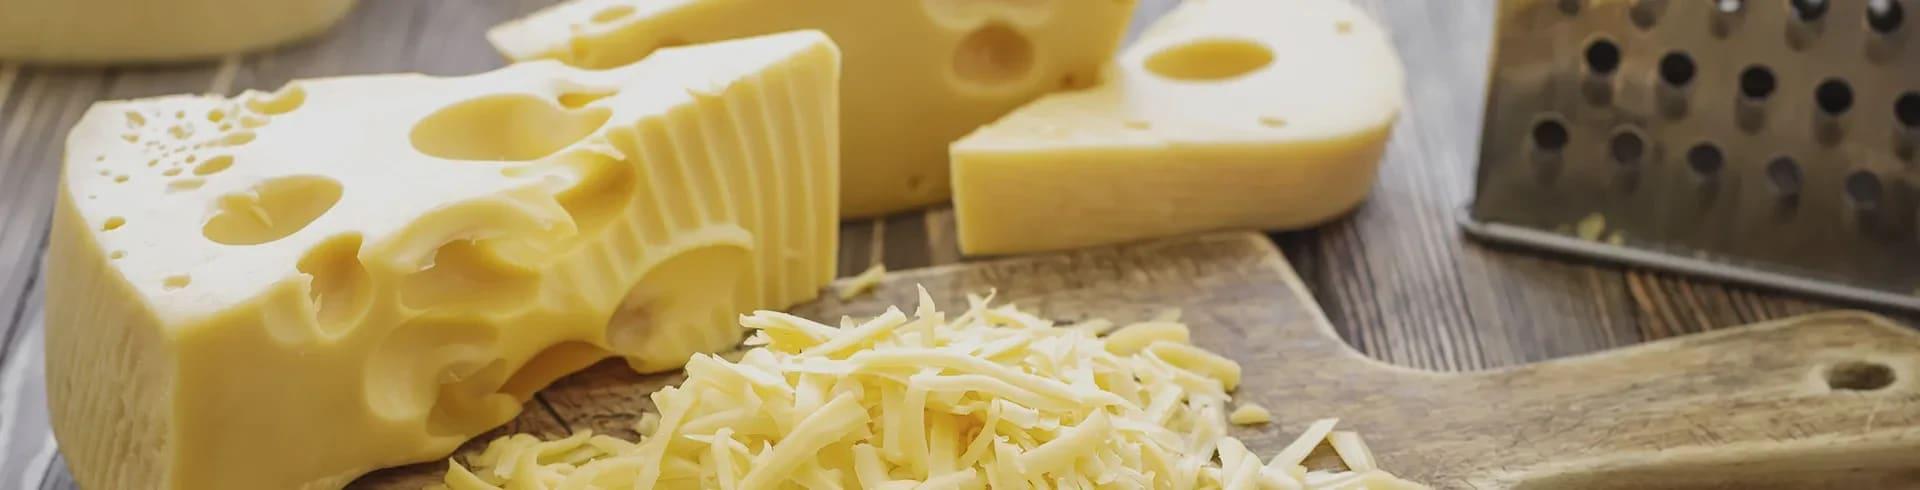 laktosfri ost ica